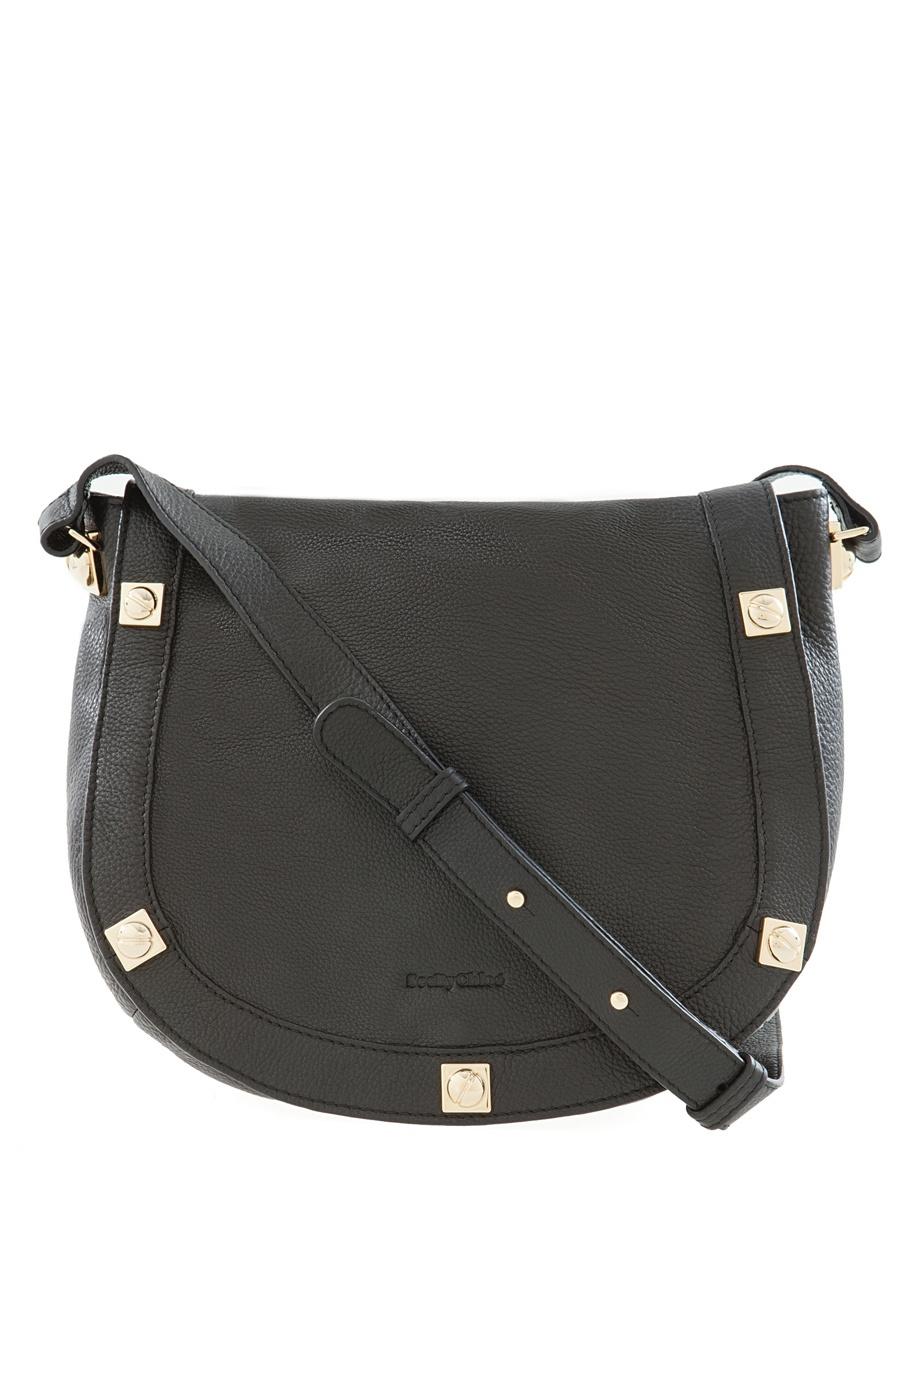 Купить женские сумки See by Chloe в интернет